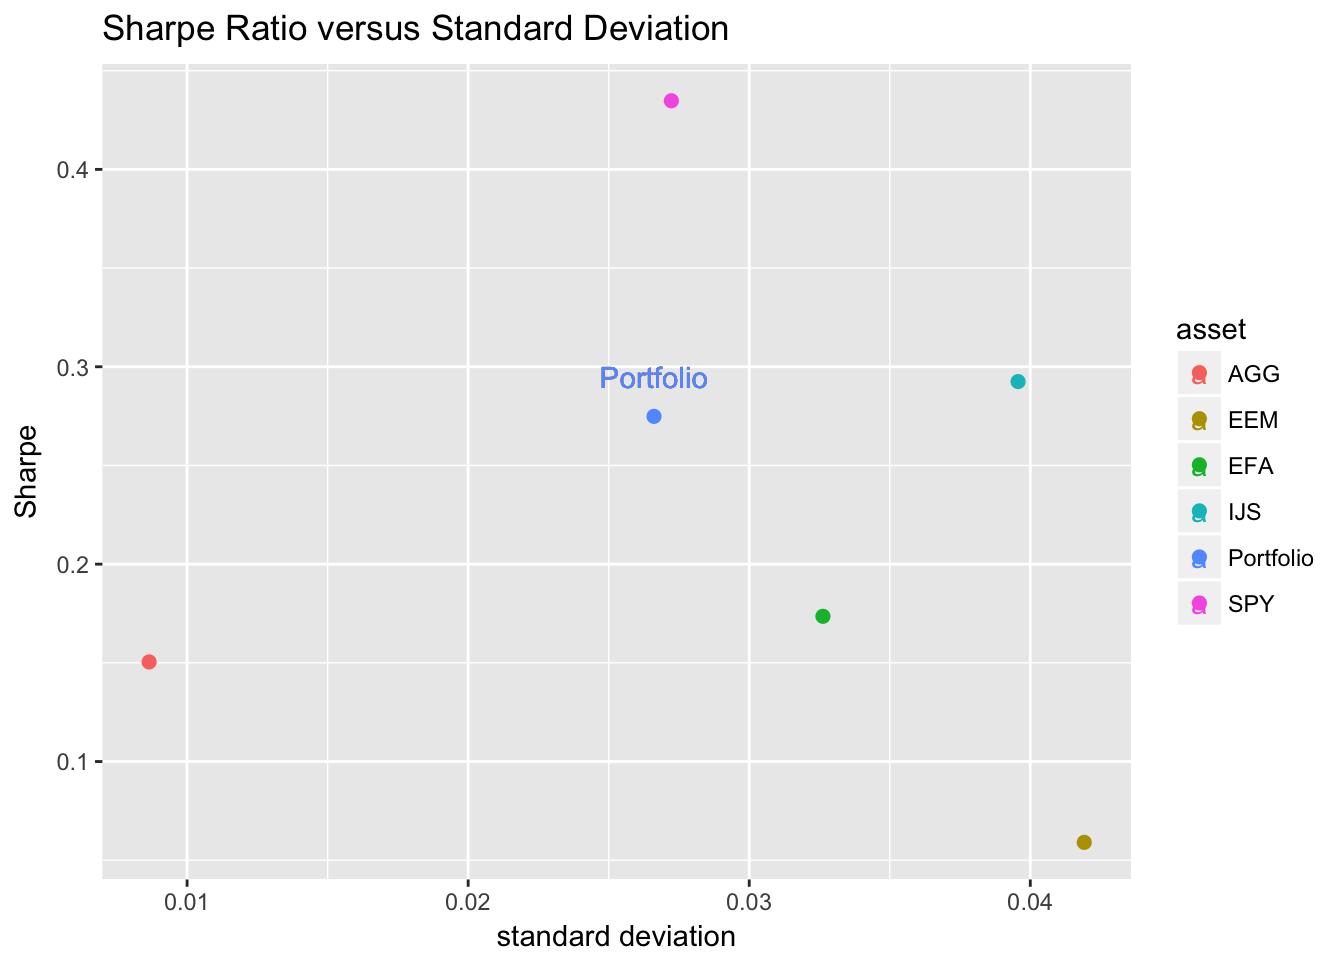 Sharpe v. Standard Deviation